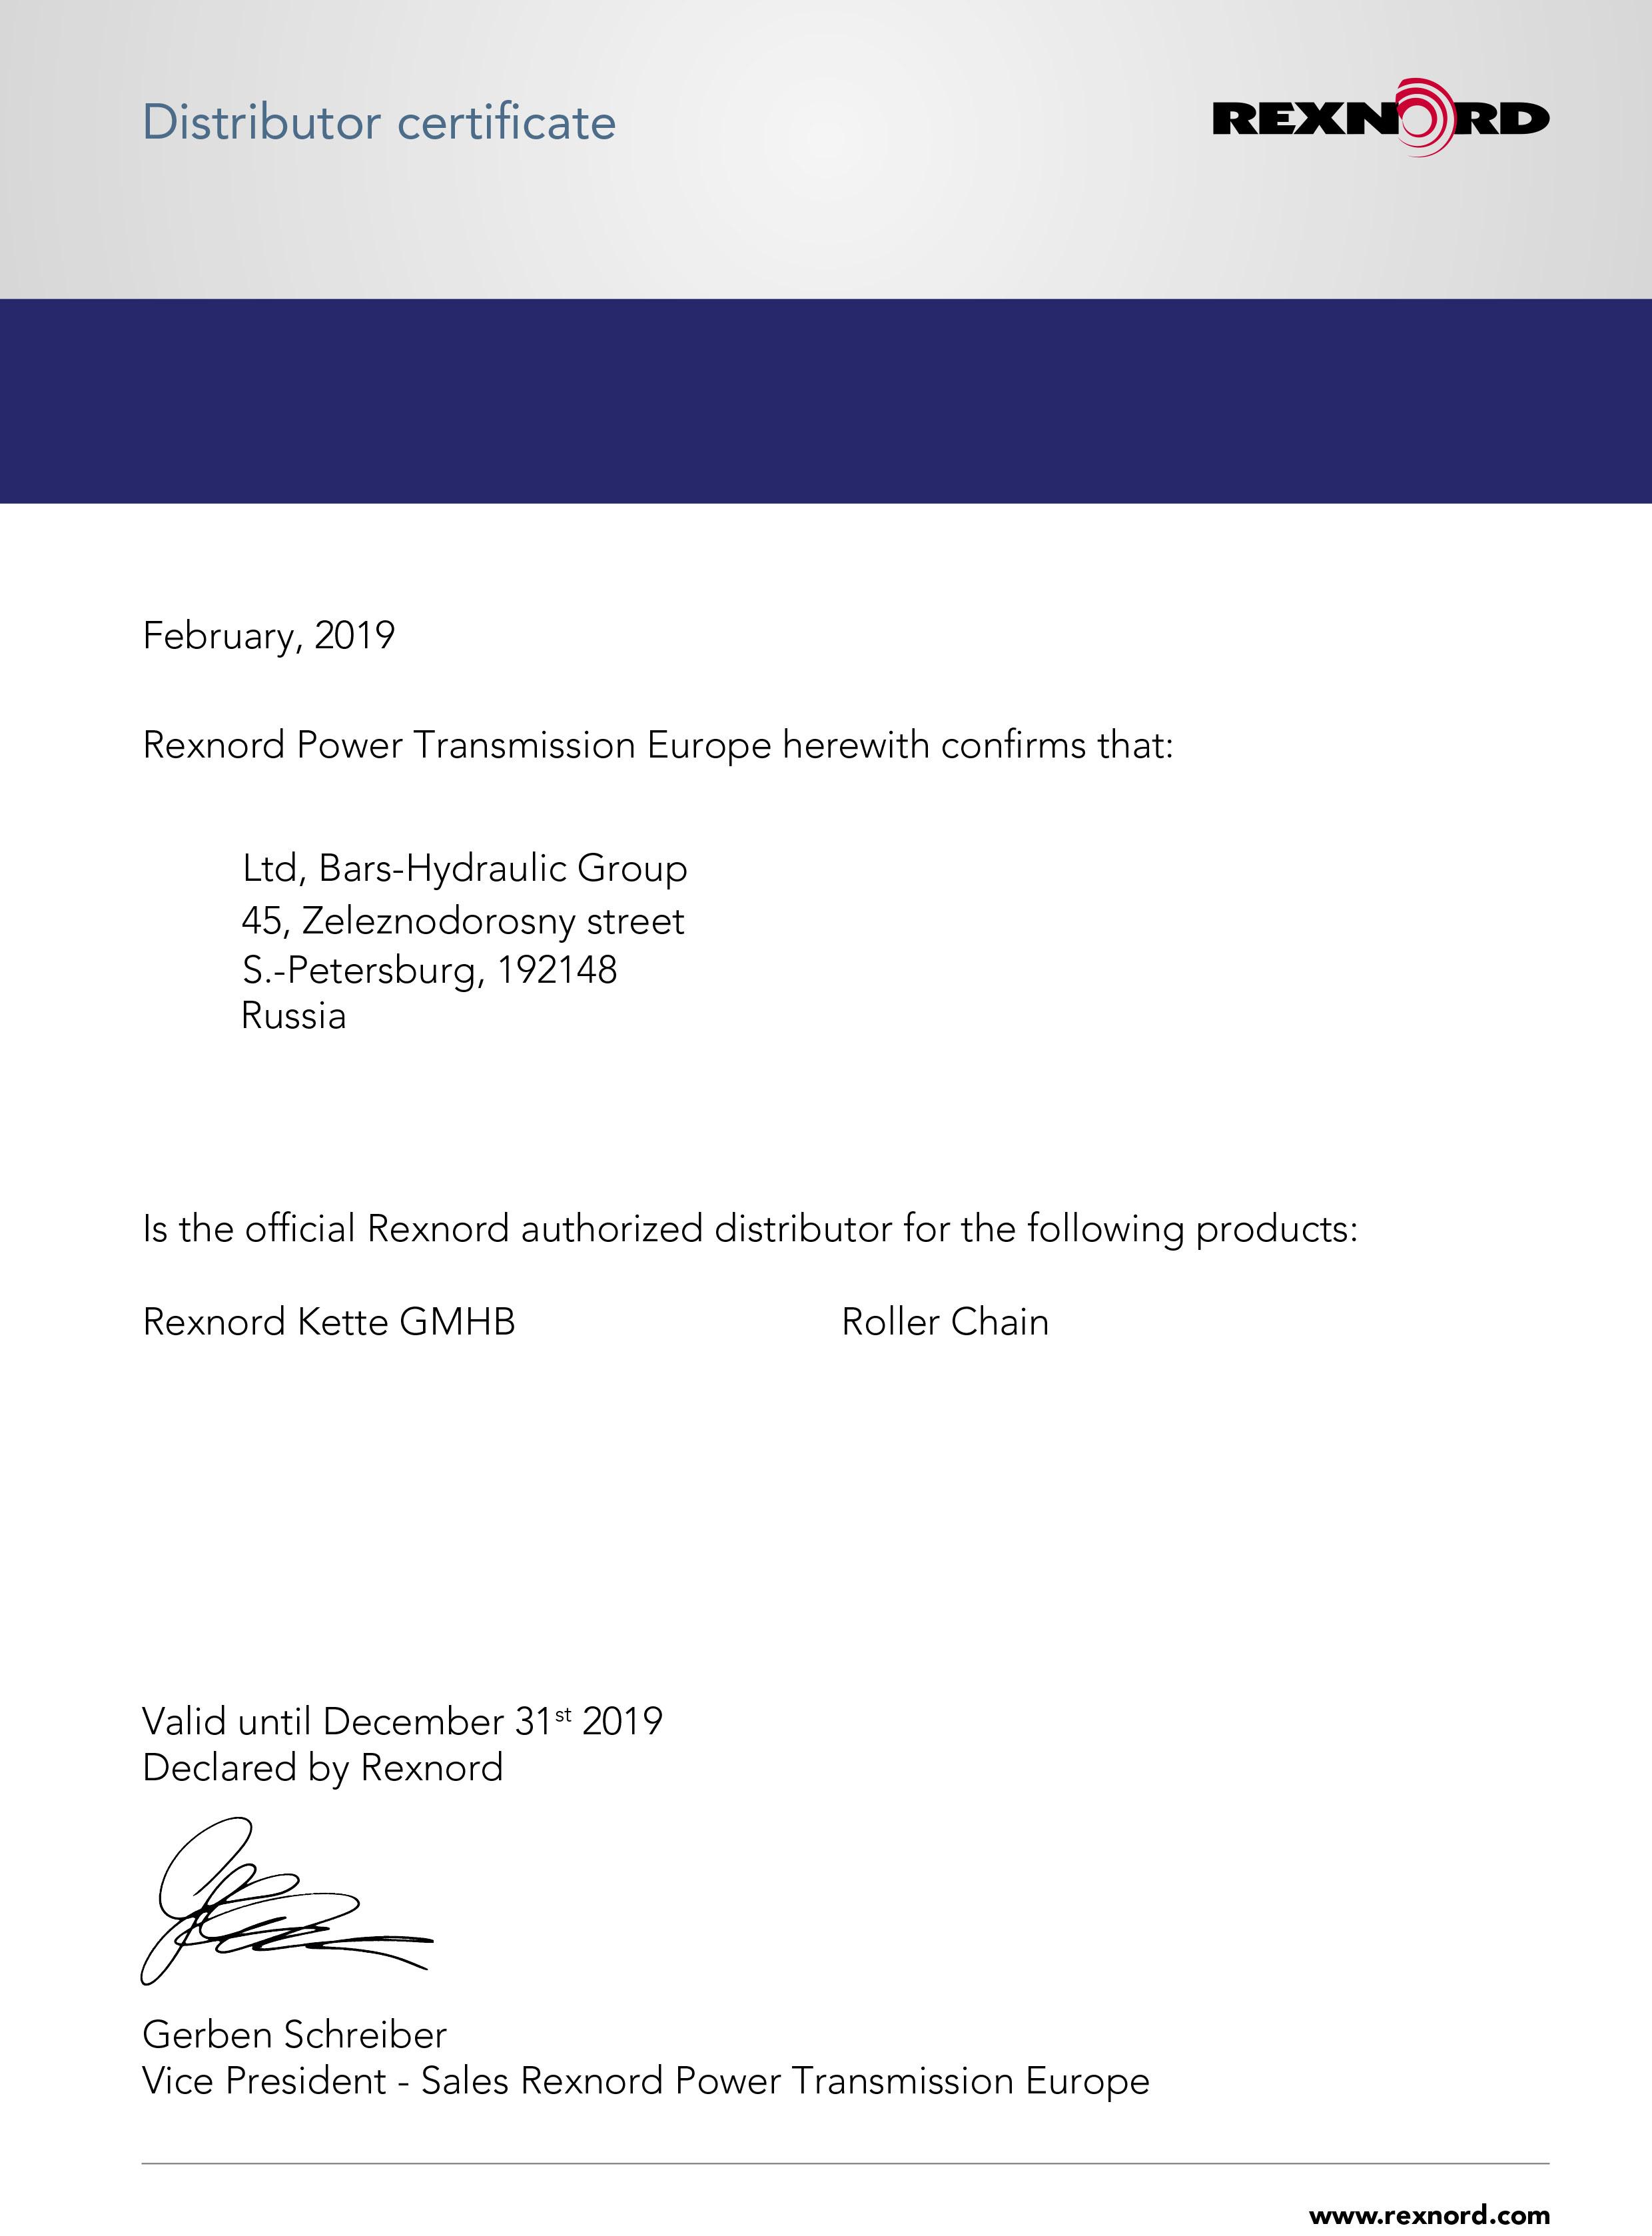 Сертификат REXNORD